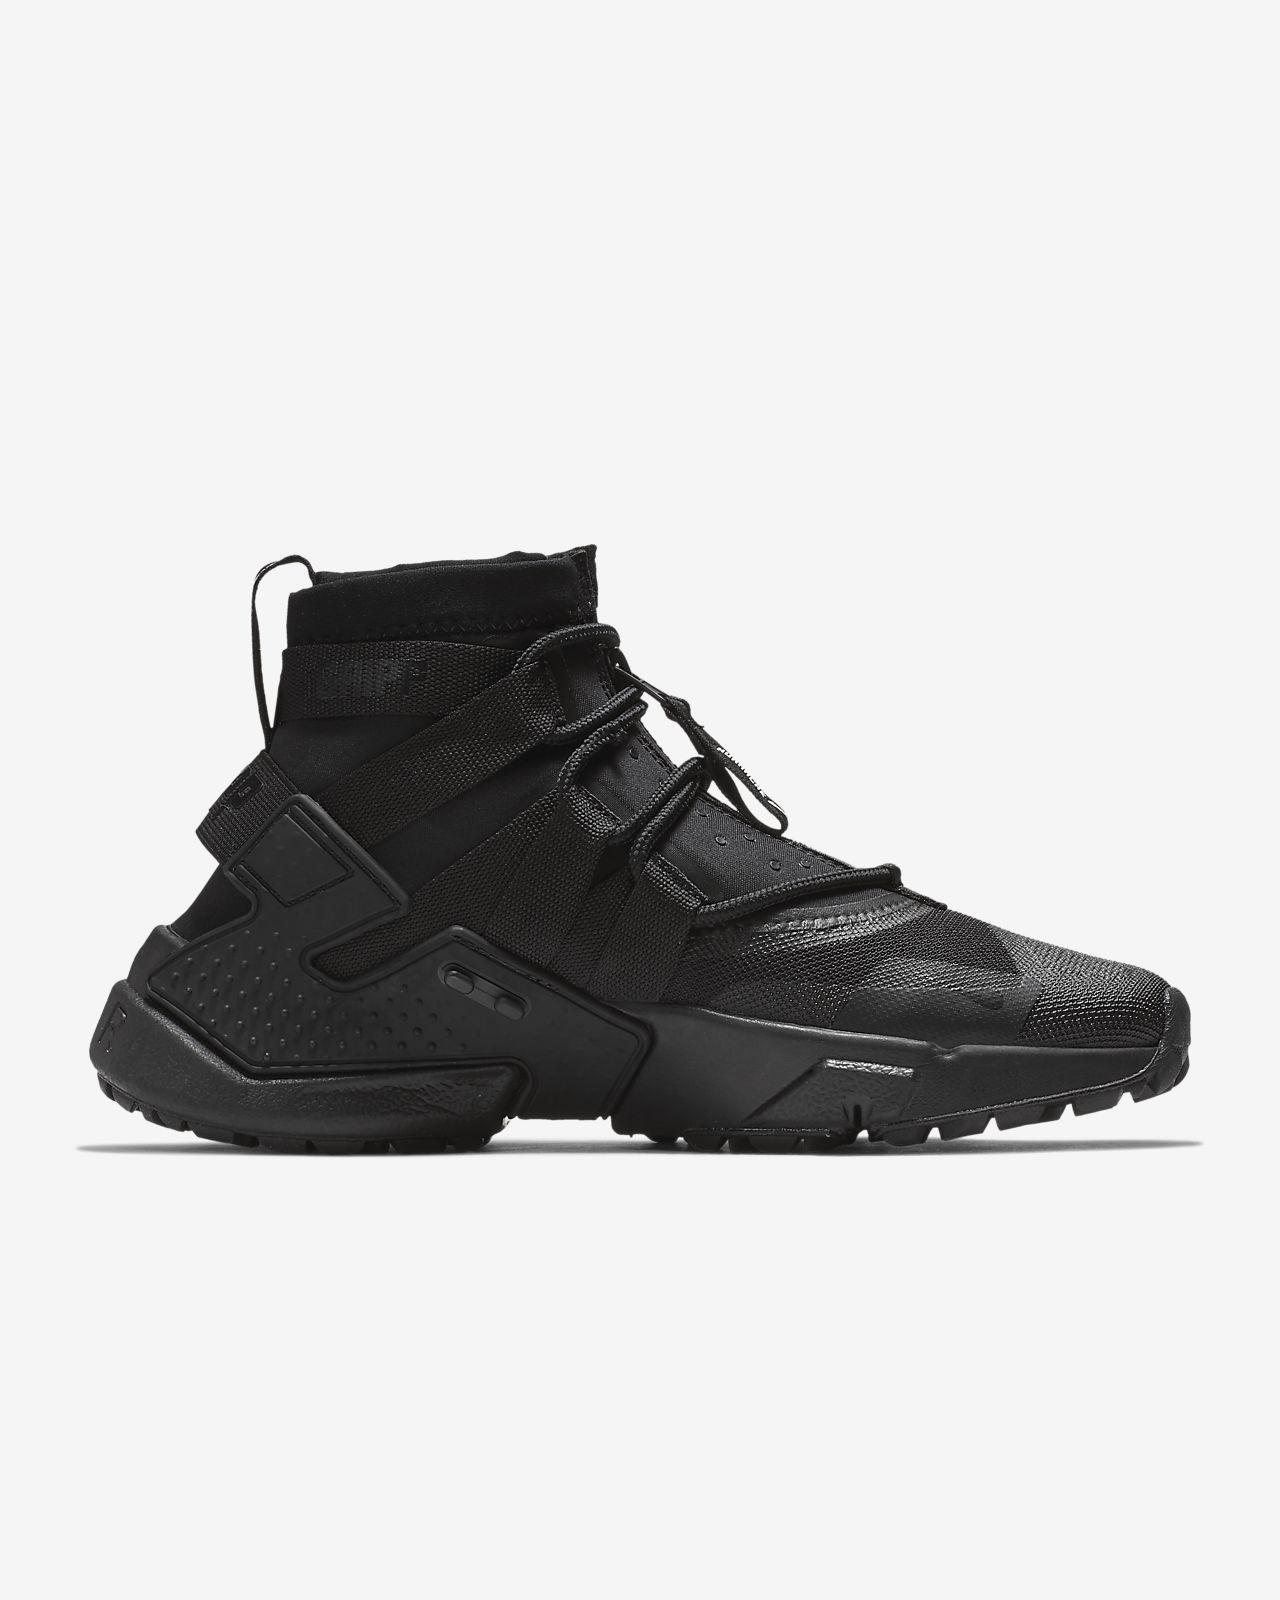 621d3485f83f5 Nike Air Huarache Gripp Men s Shoe. Nike.com